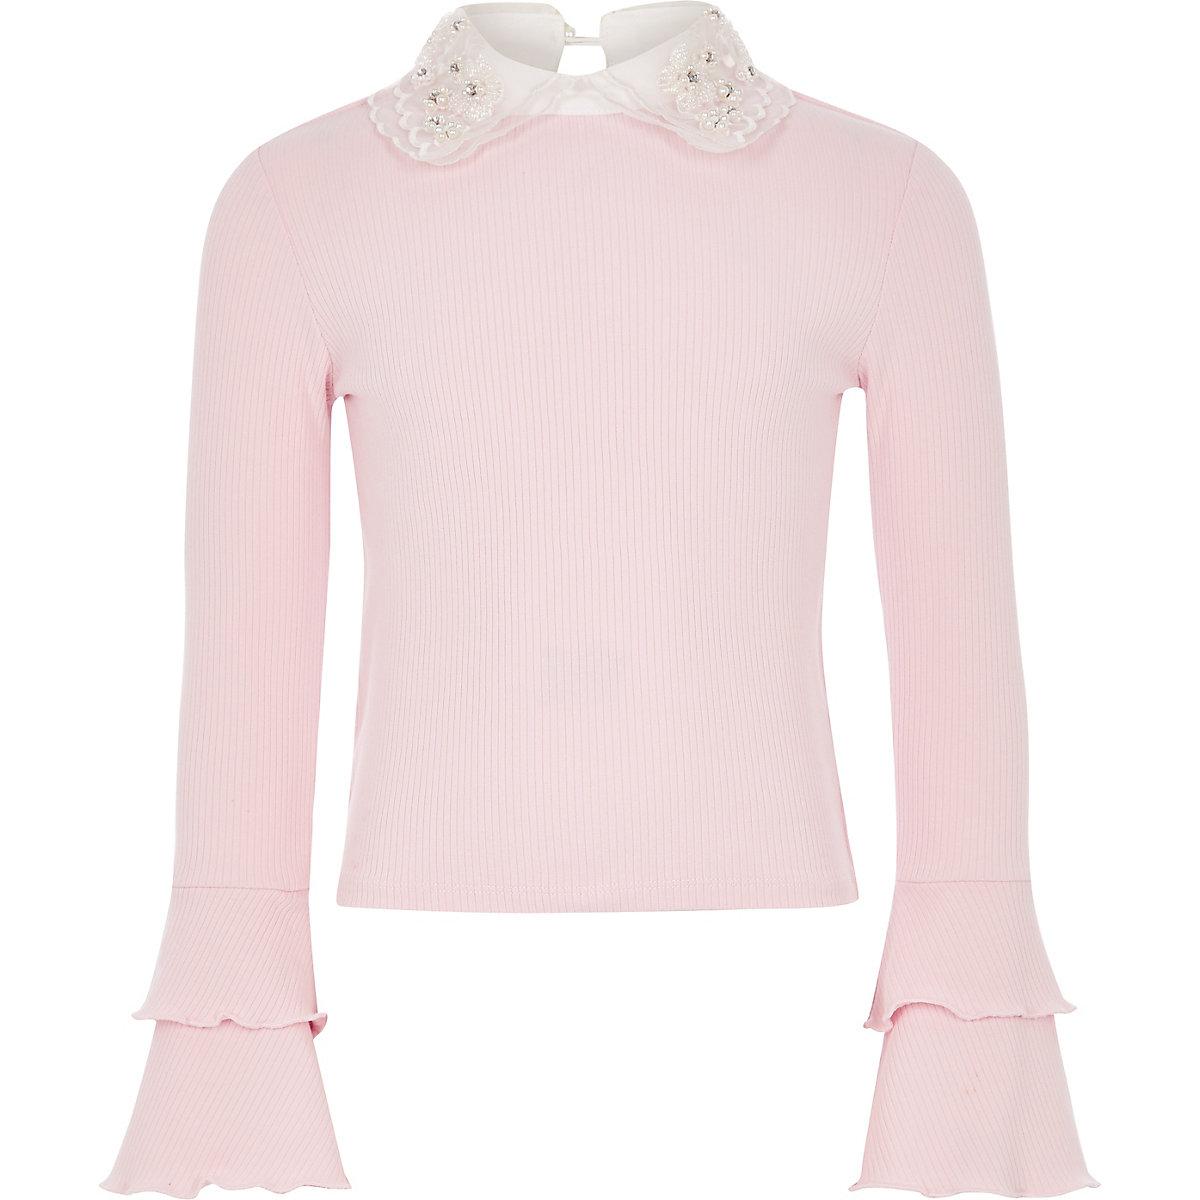 Girls light pink embellished collar frill top